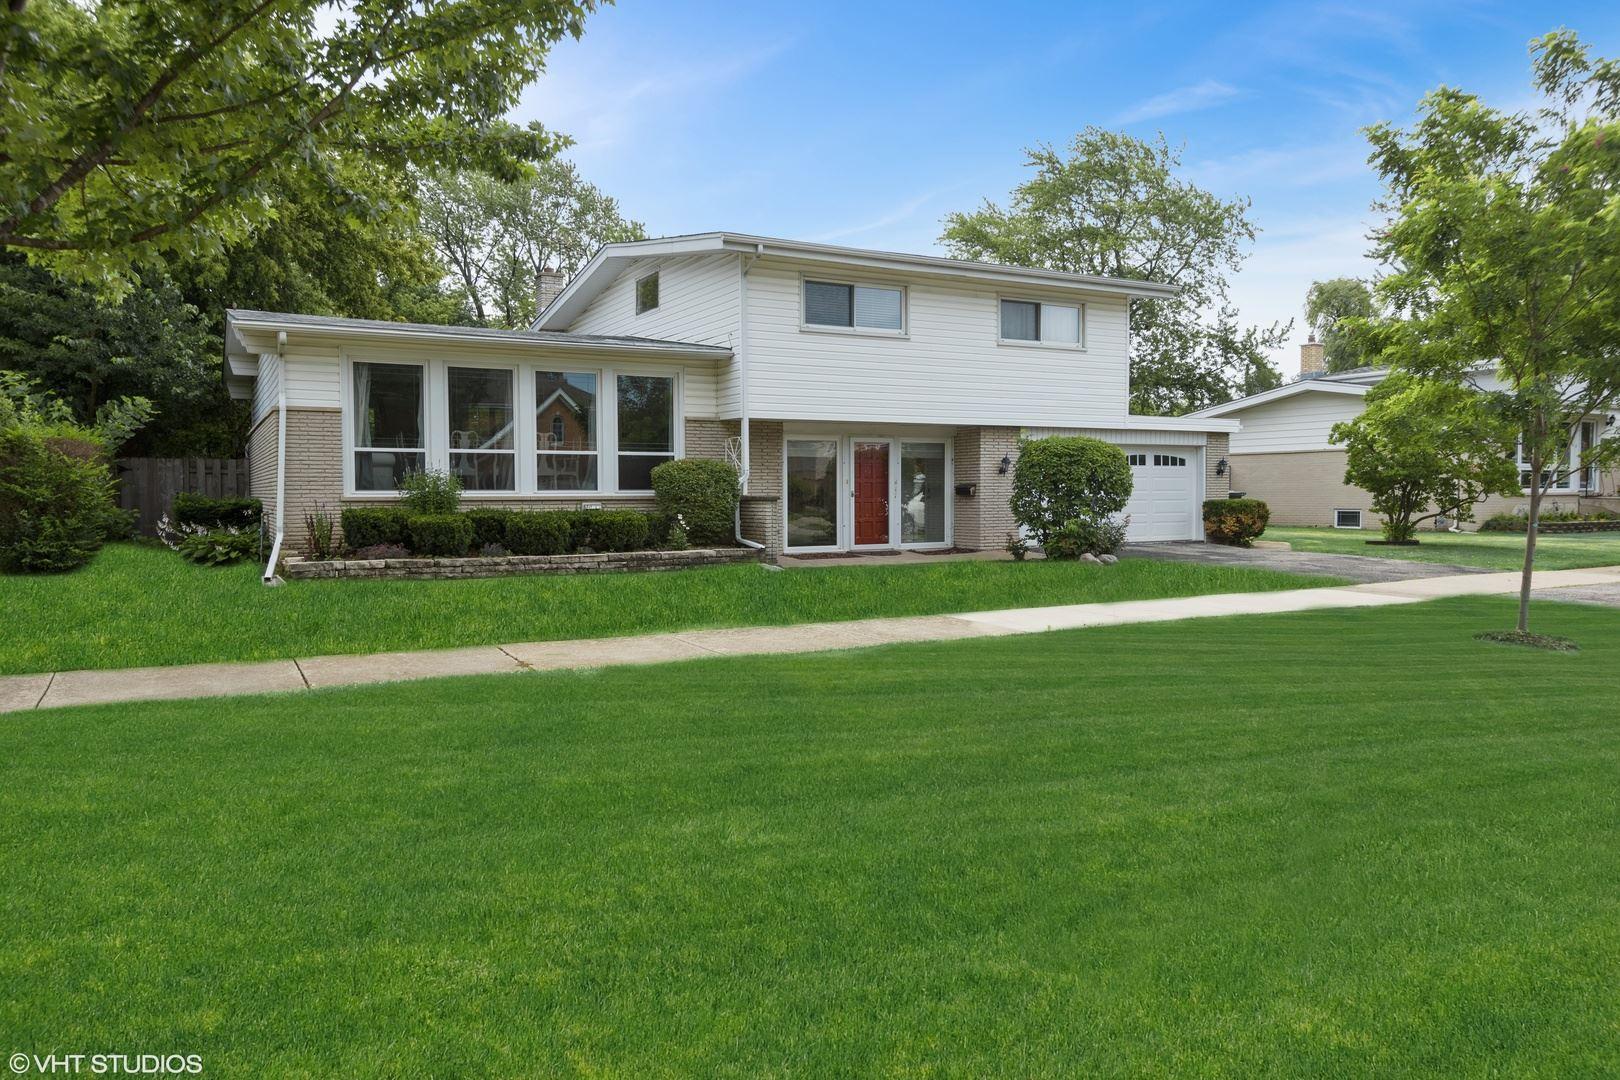 417 Huber Lane, Glenview, IL 60025 - #: 10692002